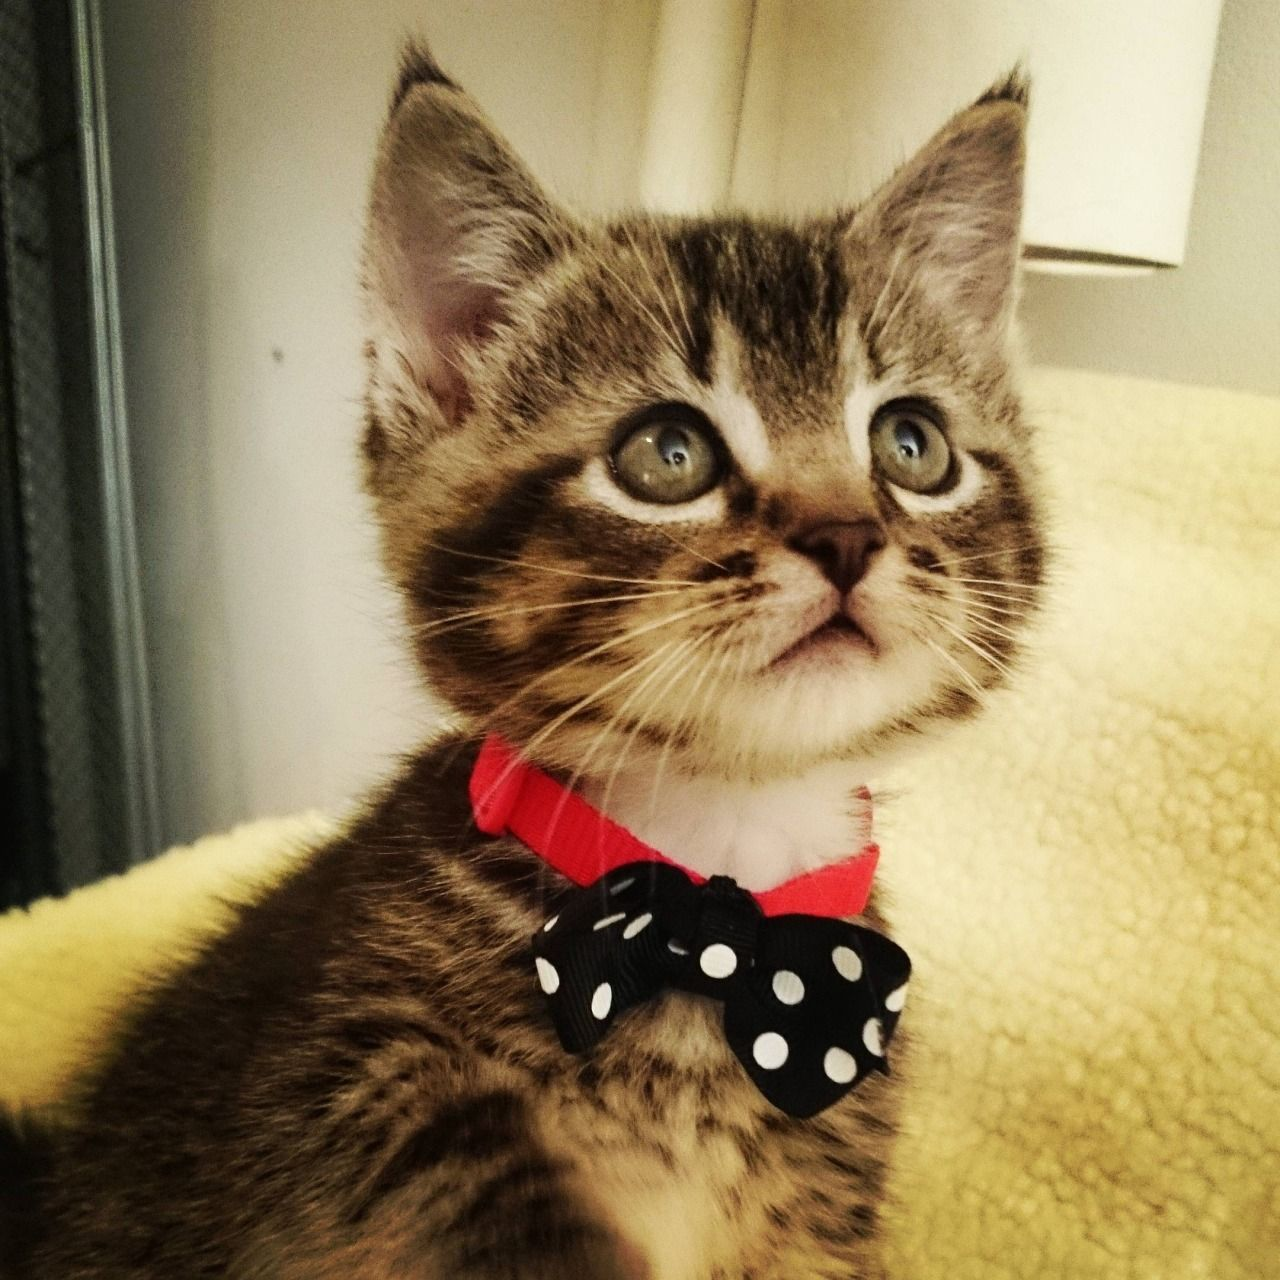 awwww! Cute! — Hey Reddit, meet Link. He likes to keep it